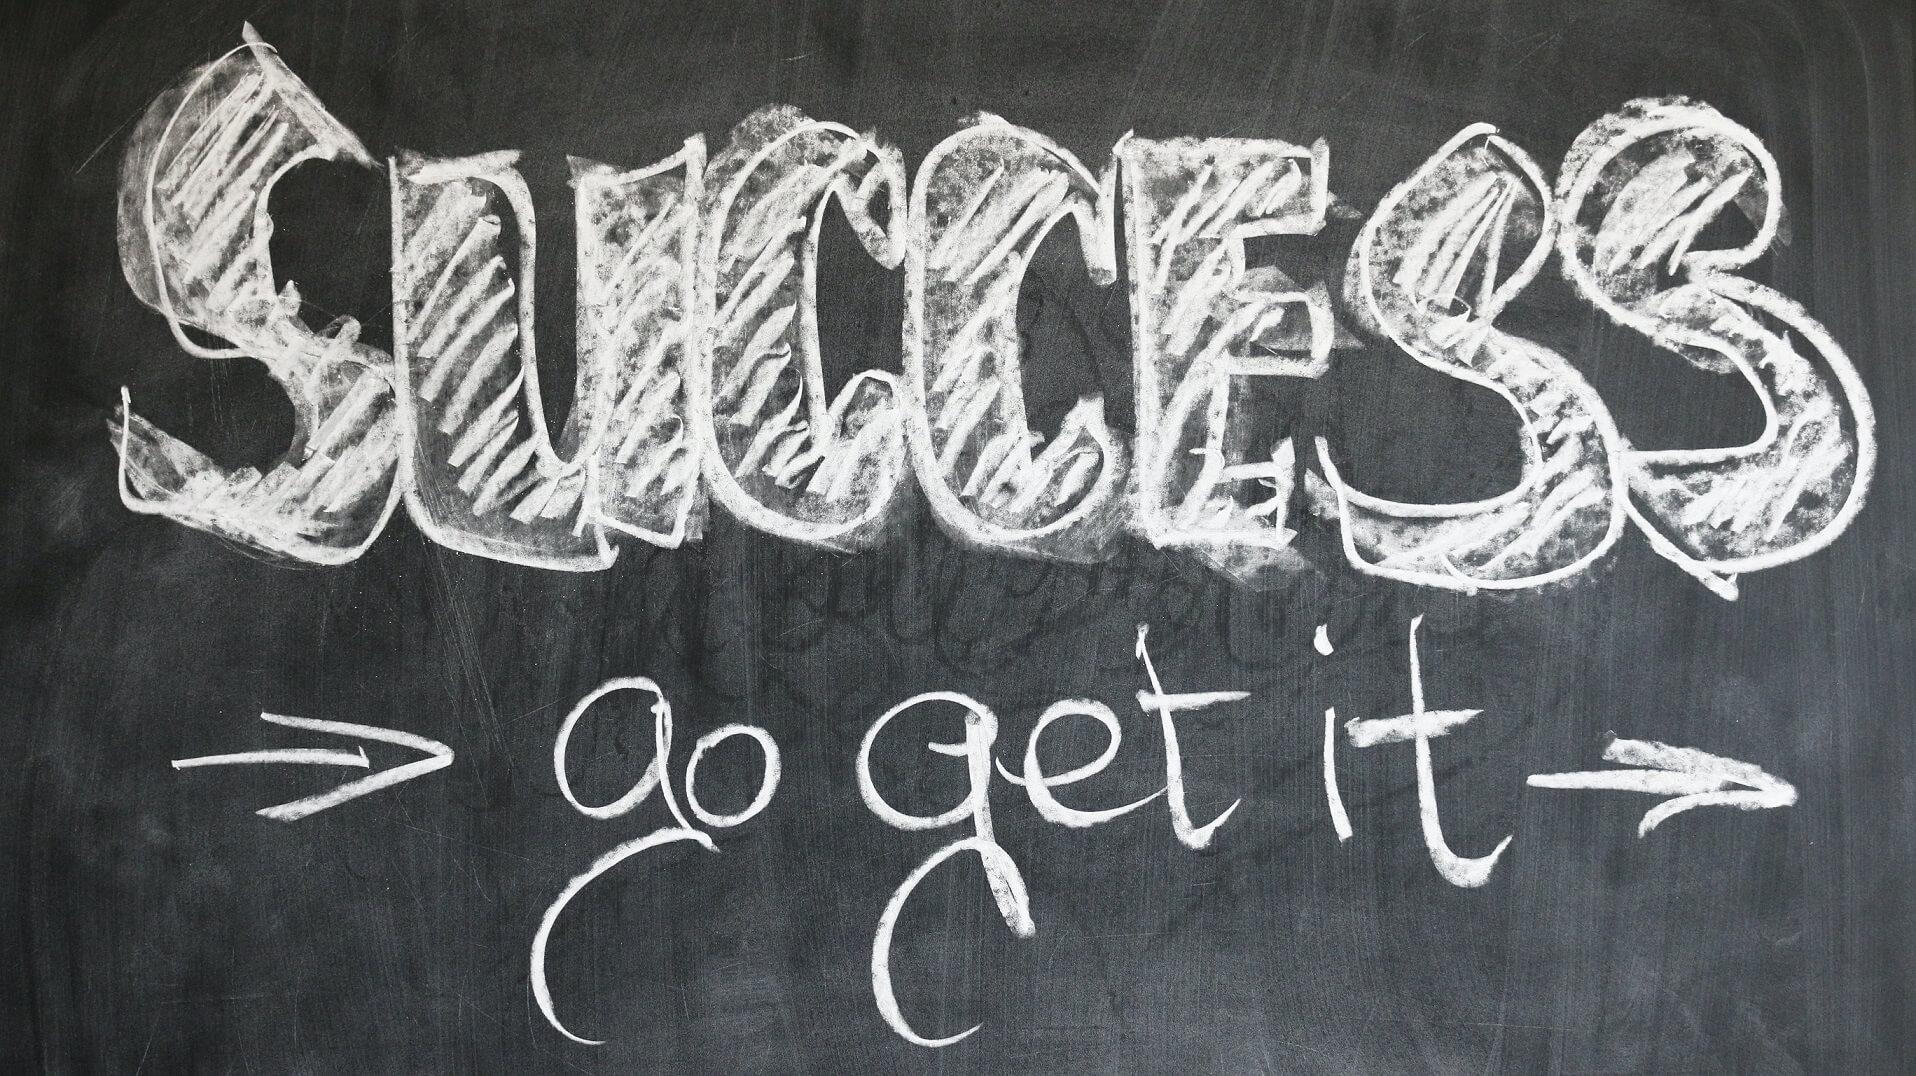 objectif sportif : lâcher prise pour mieux rebondir | Performance et coaching